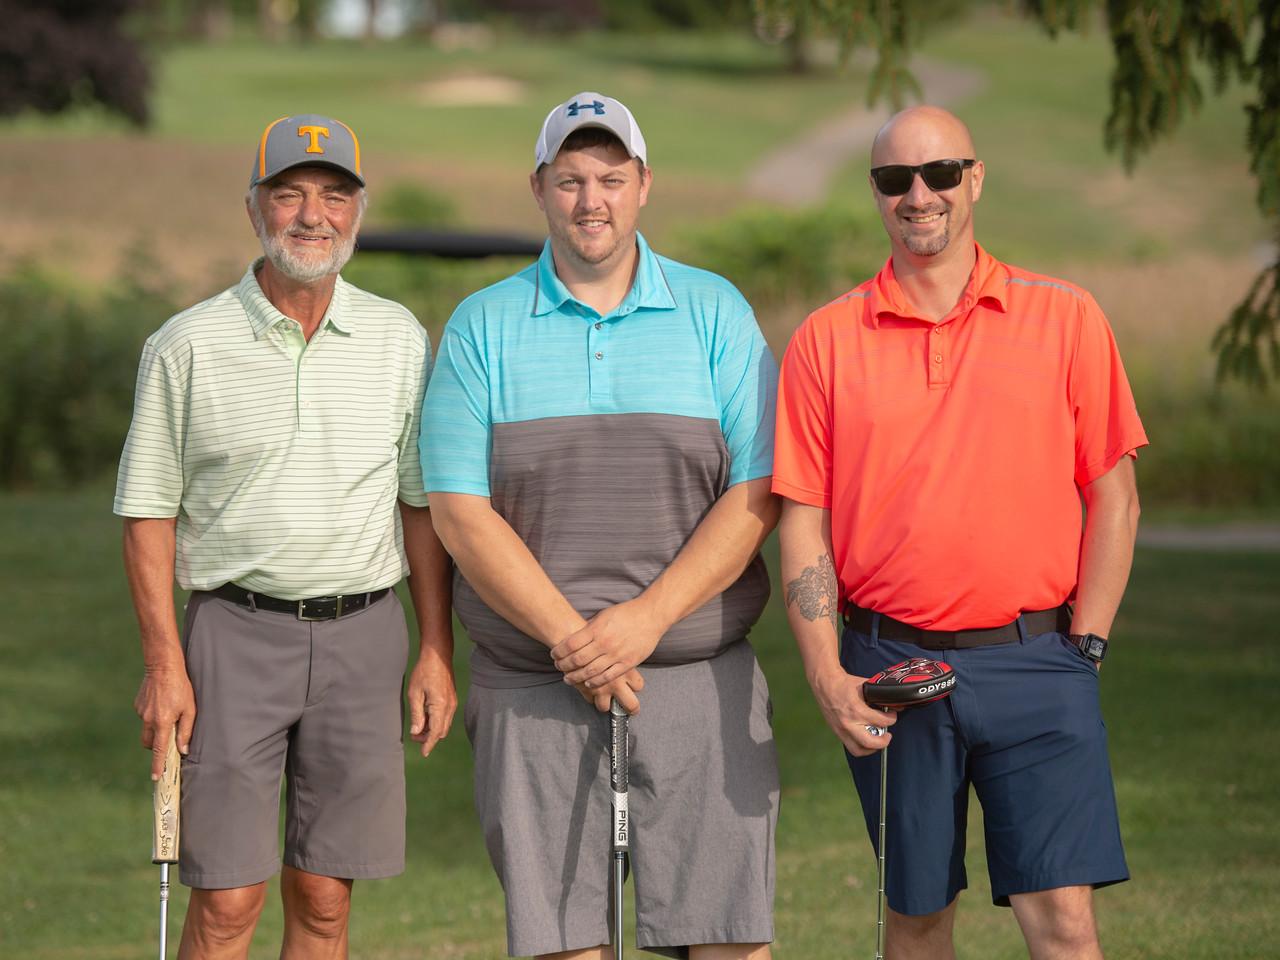 2020_golf_outing_ND40377.jpg